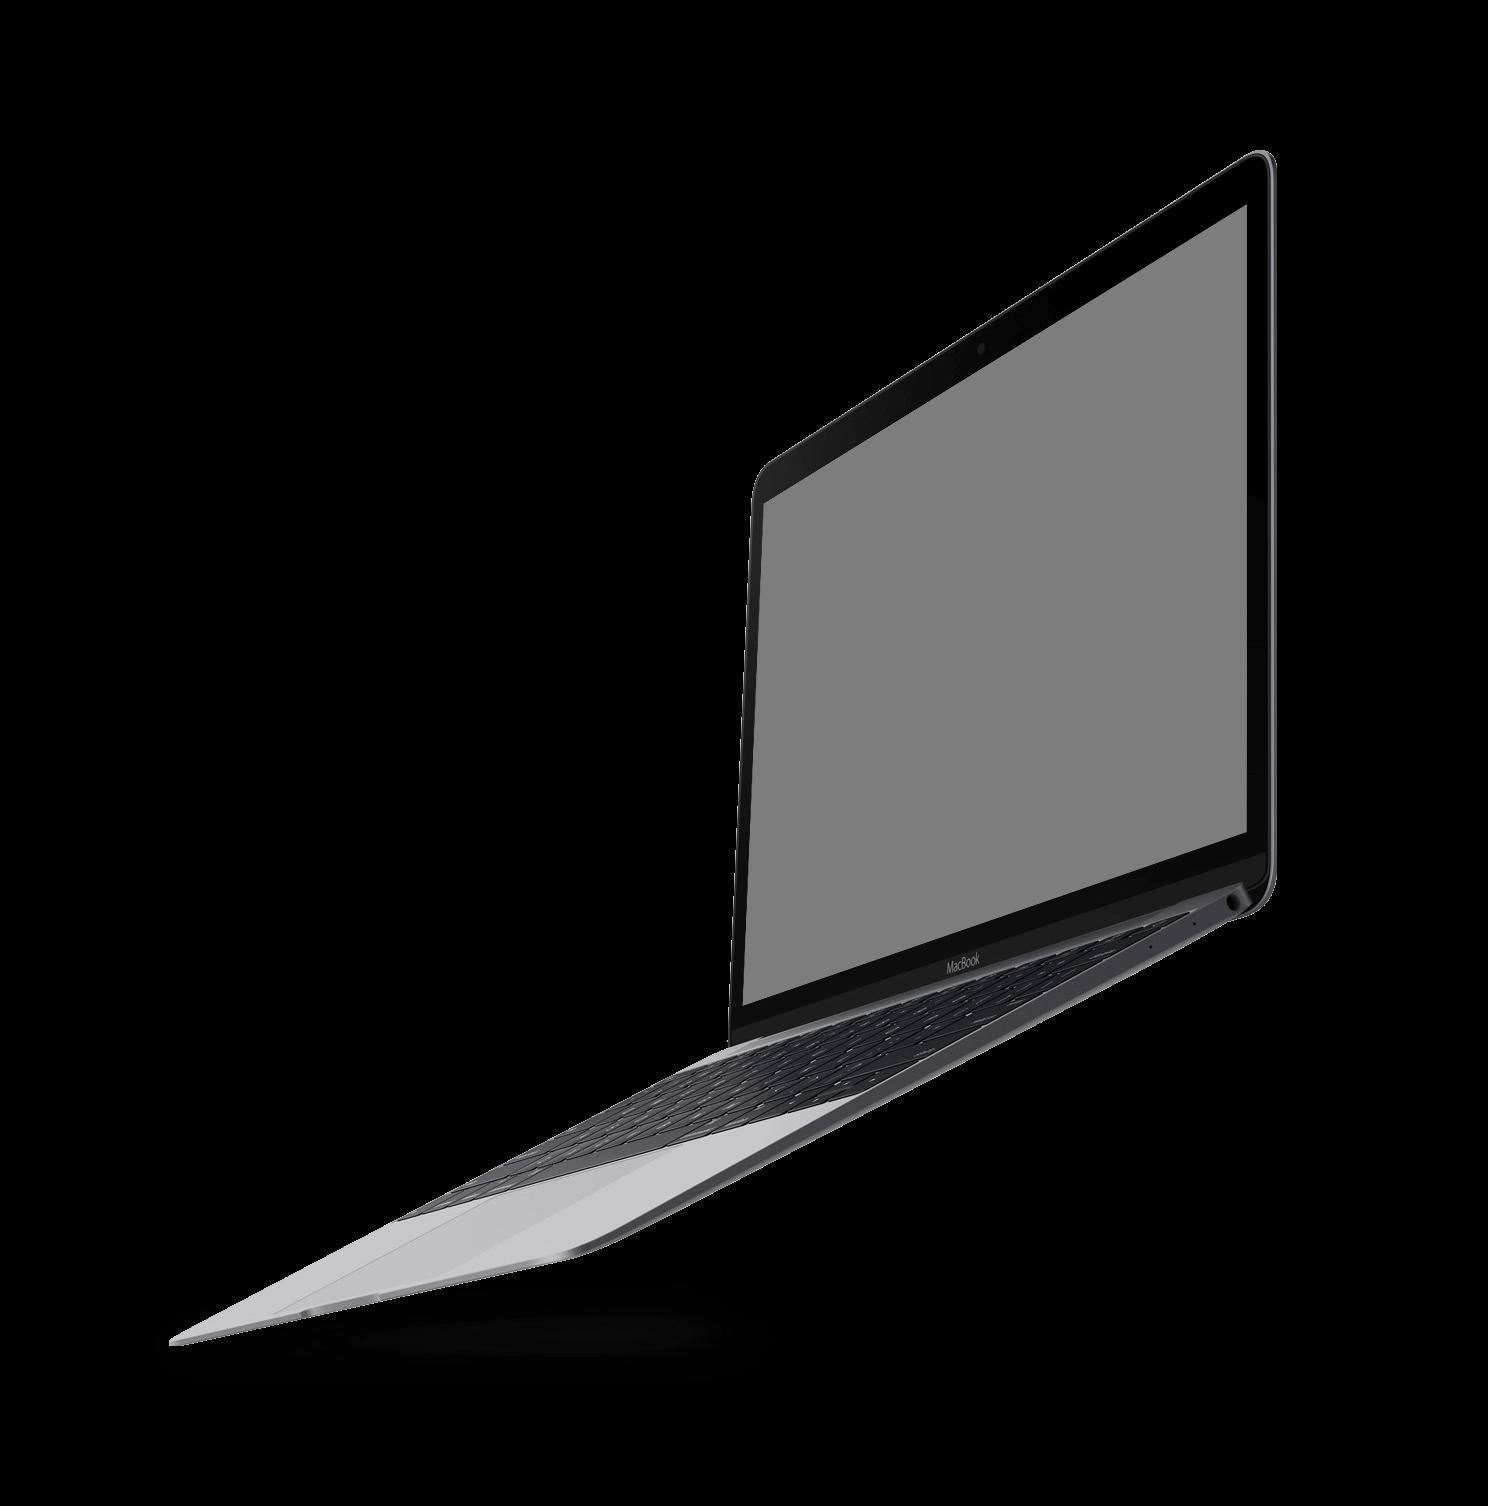 Ultra-thin laptop